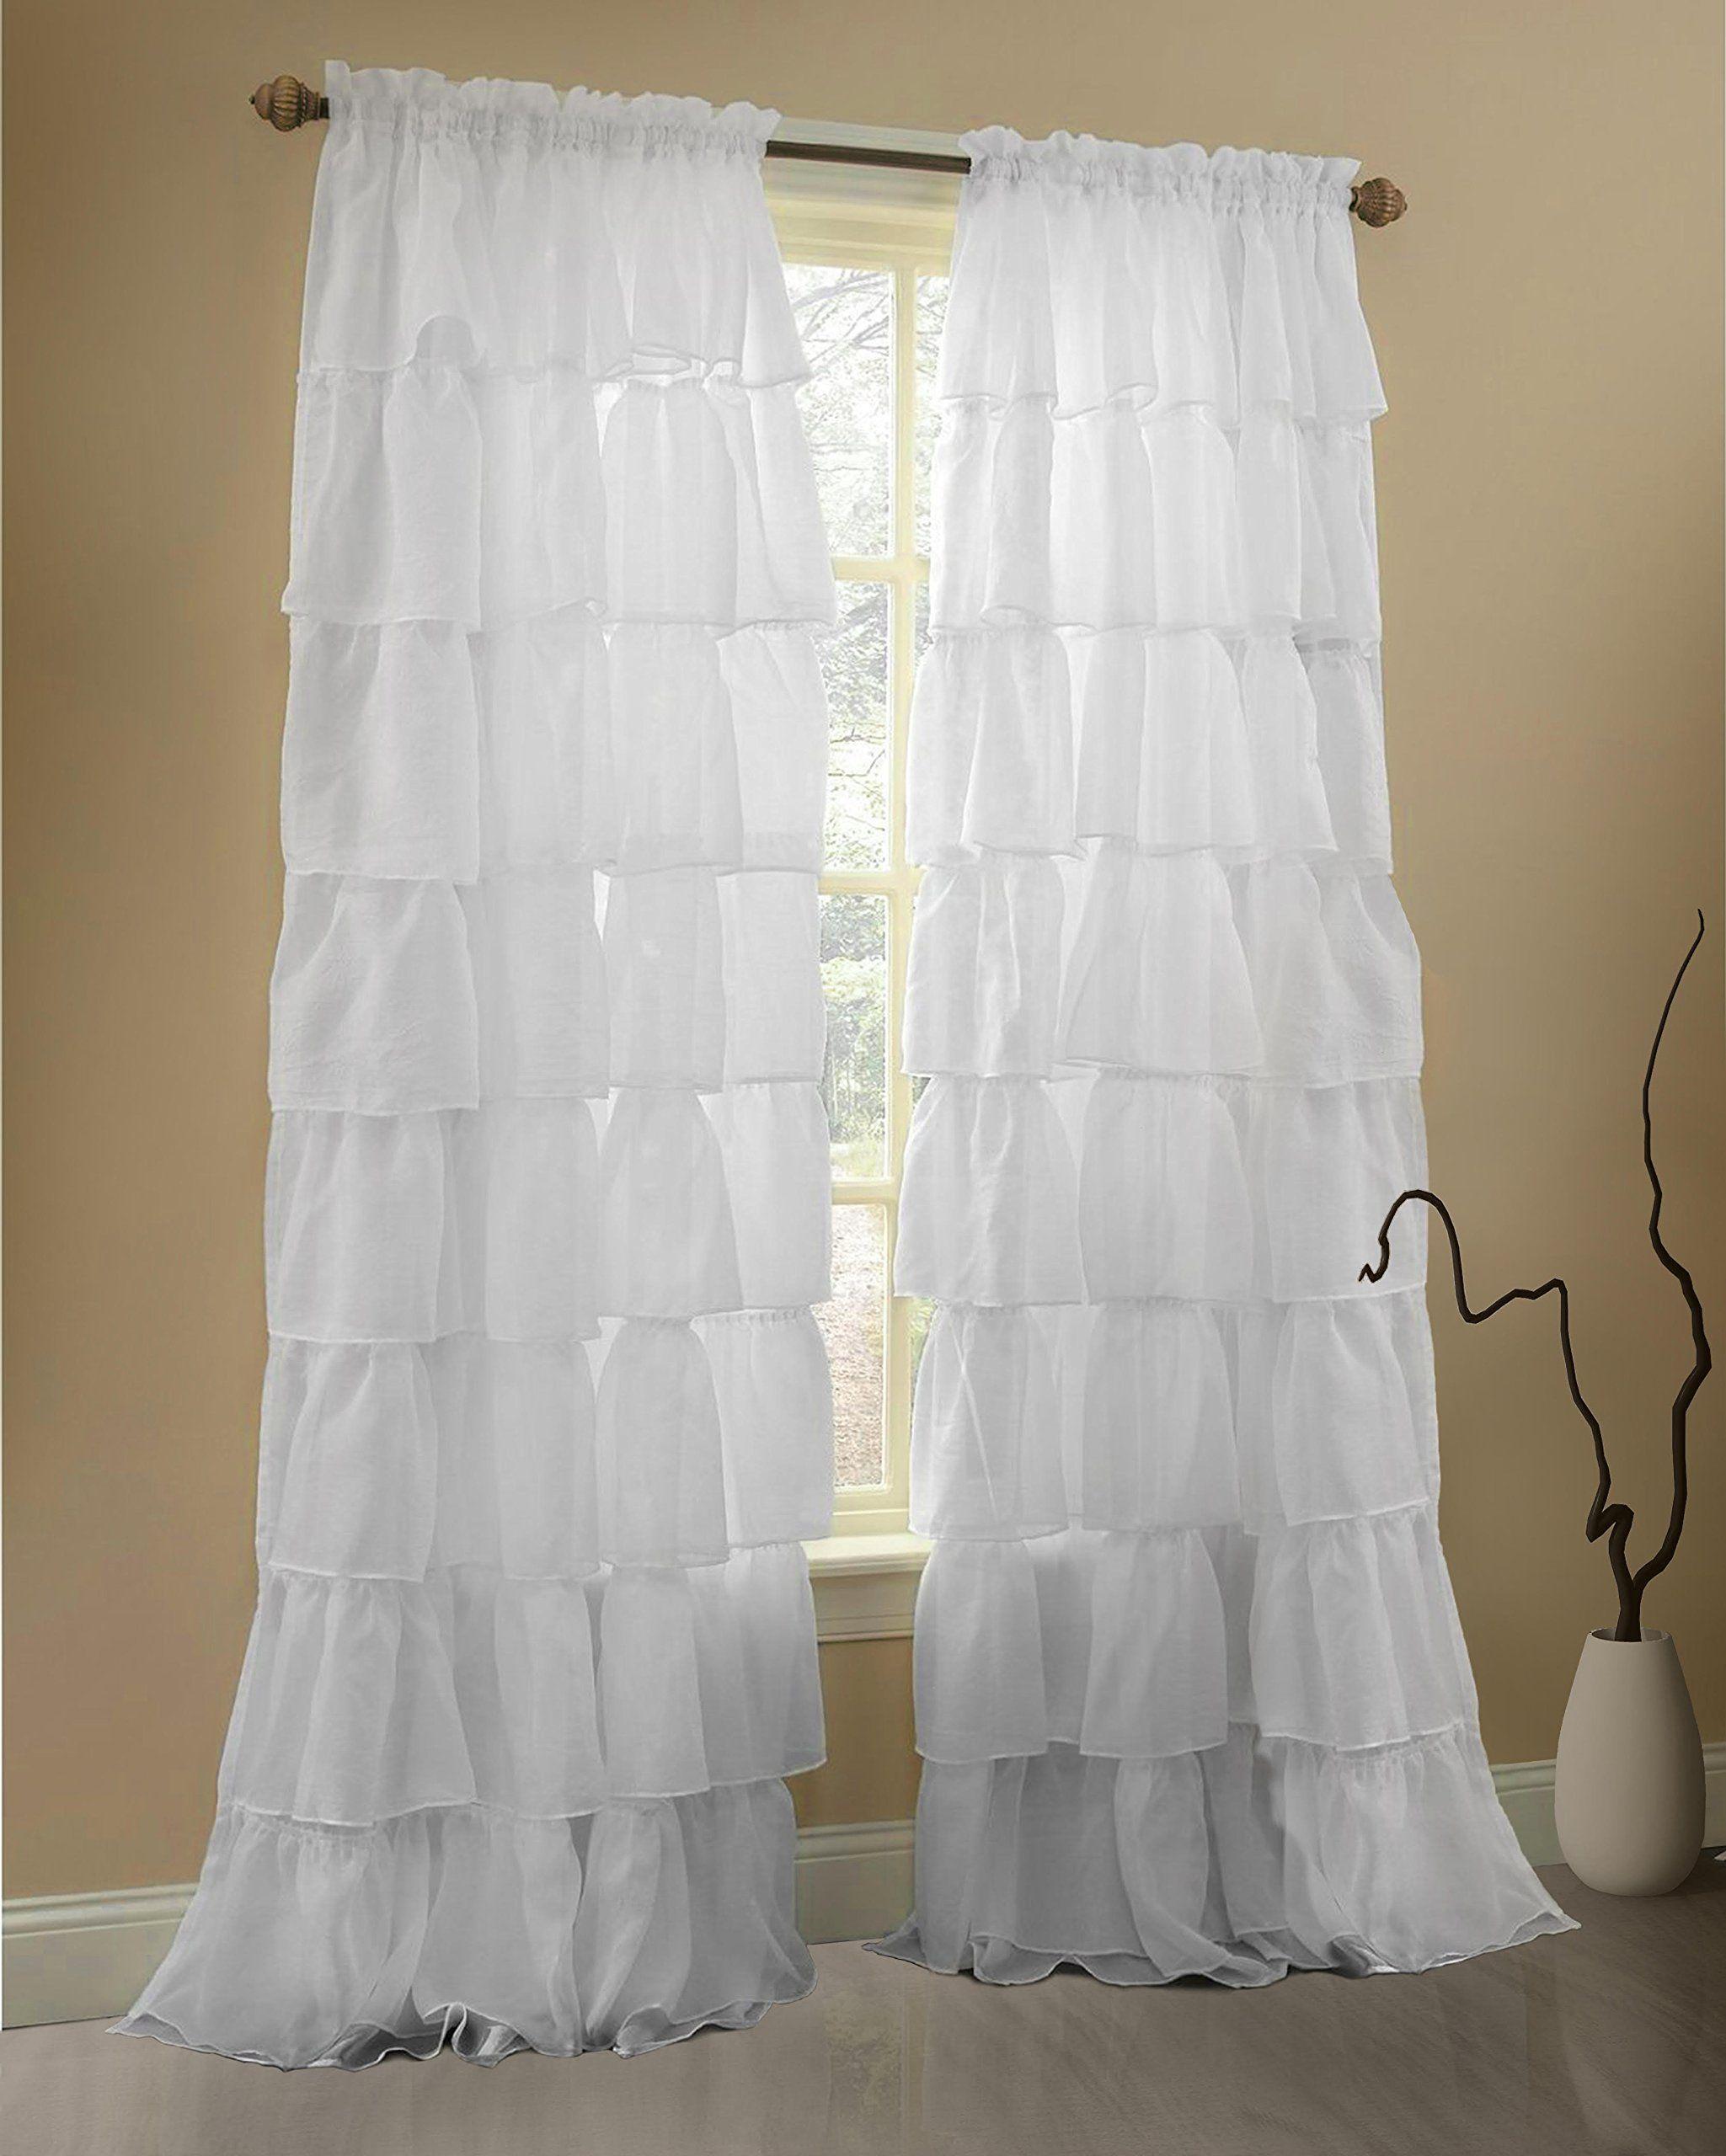 Gee di moda ruffle curtains rod pocket window curtains panels white